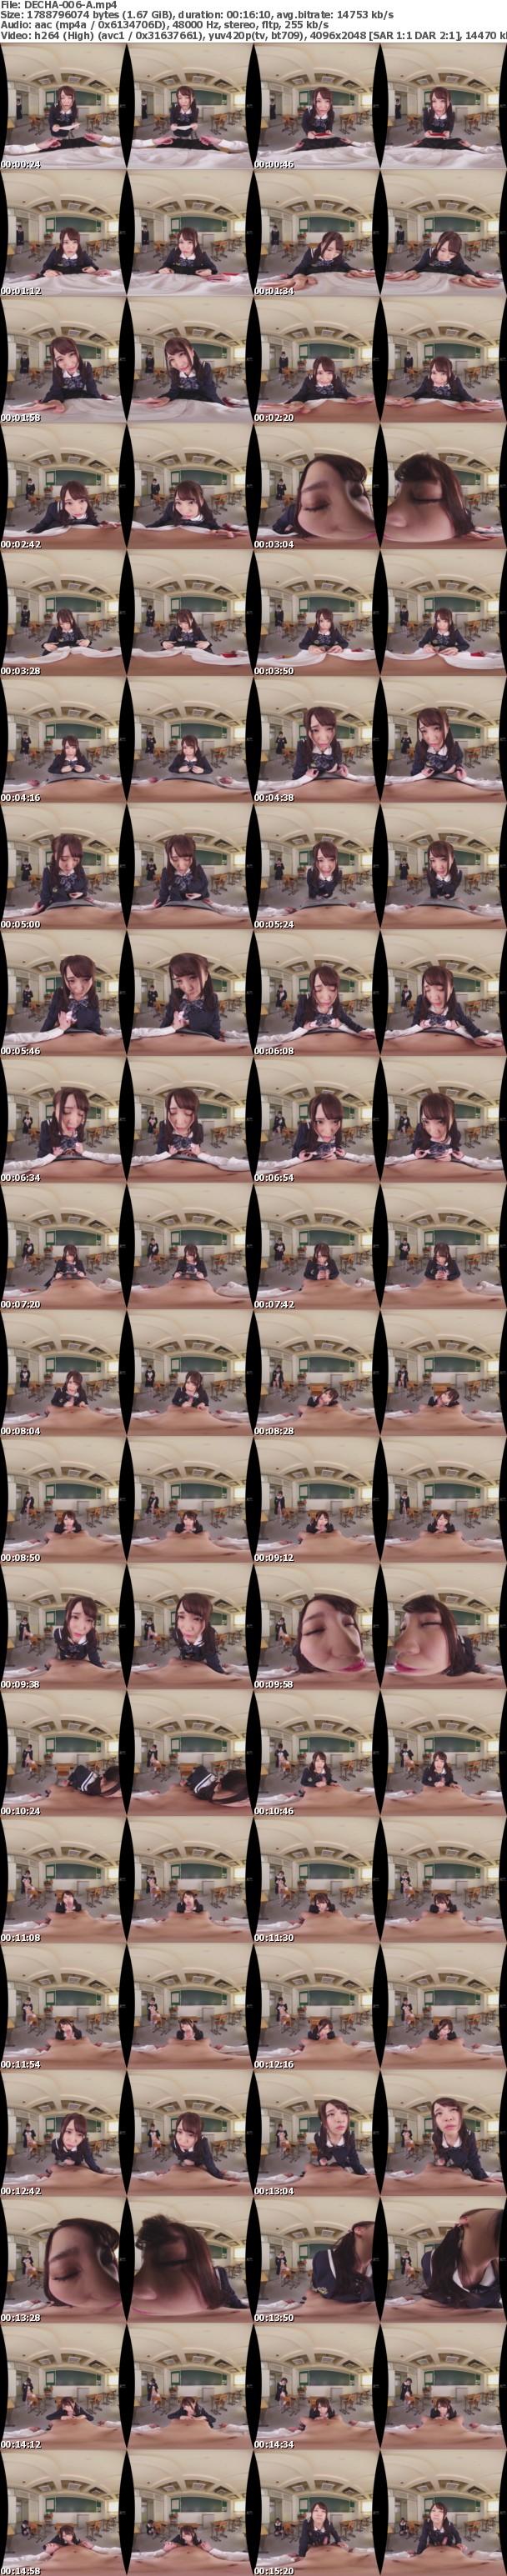 (VR) DECHA-006 VR 僕と彼女と彼女の姉のEXな三角関係 加藤ももか・初美りん